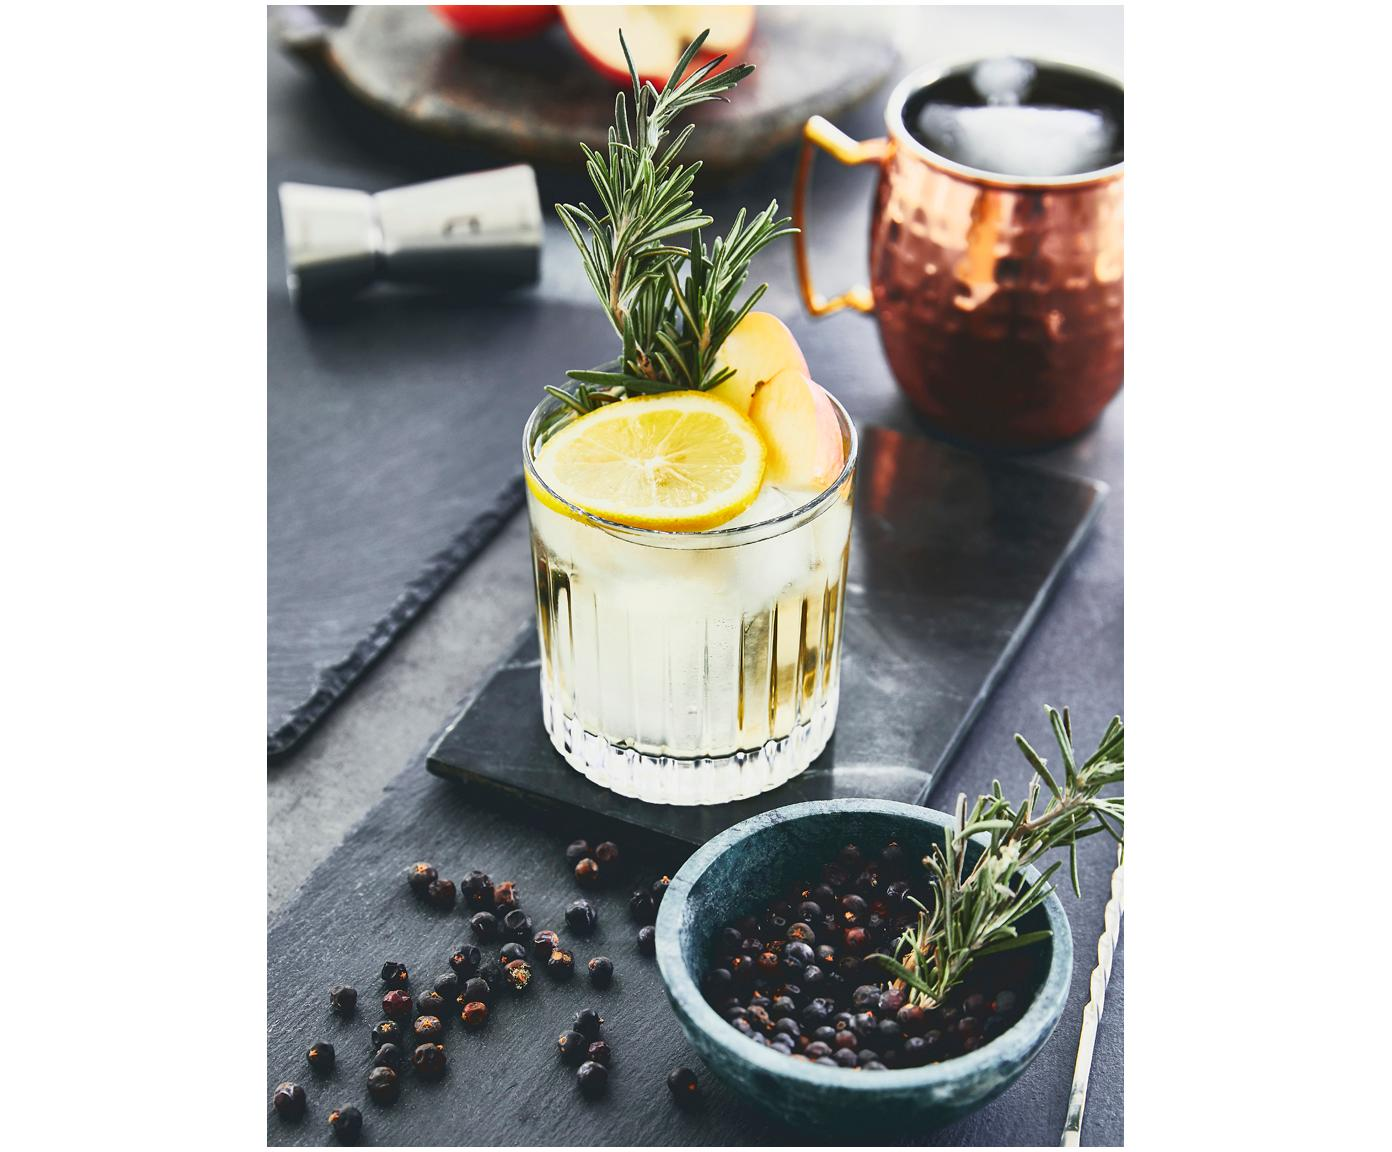 Kryształowa szklanka do whisky Timeless, 6 szt., Szkło kryształowe, Transparentny, Ø 9 x W 9 cm